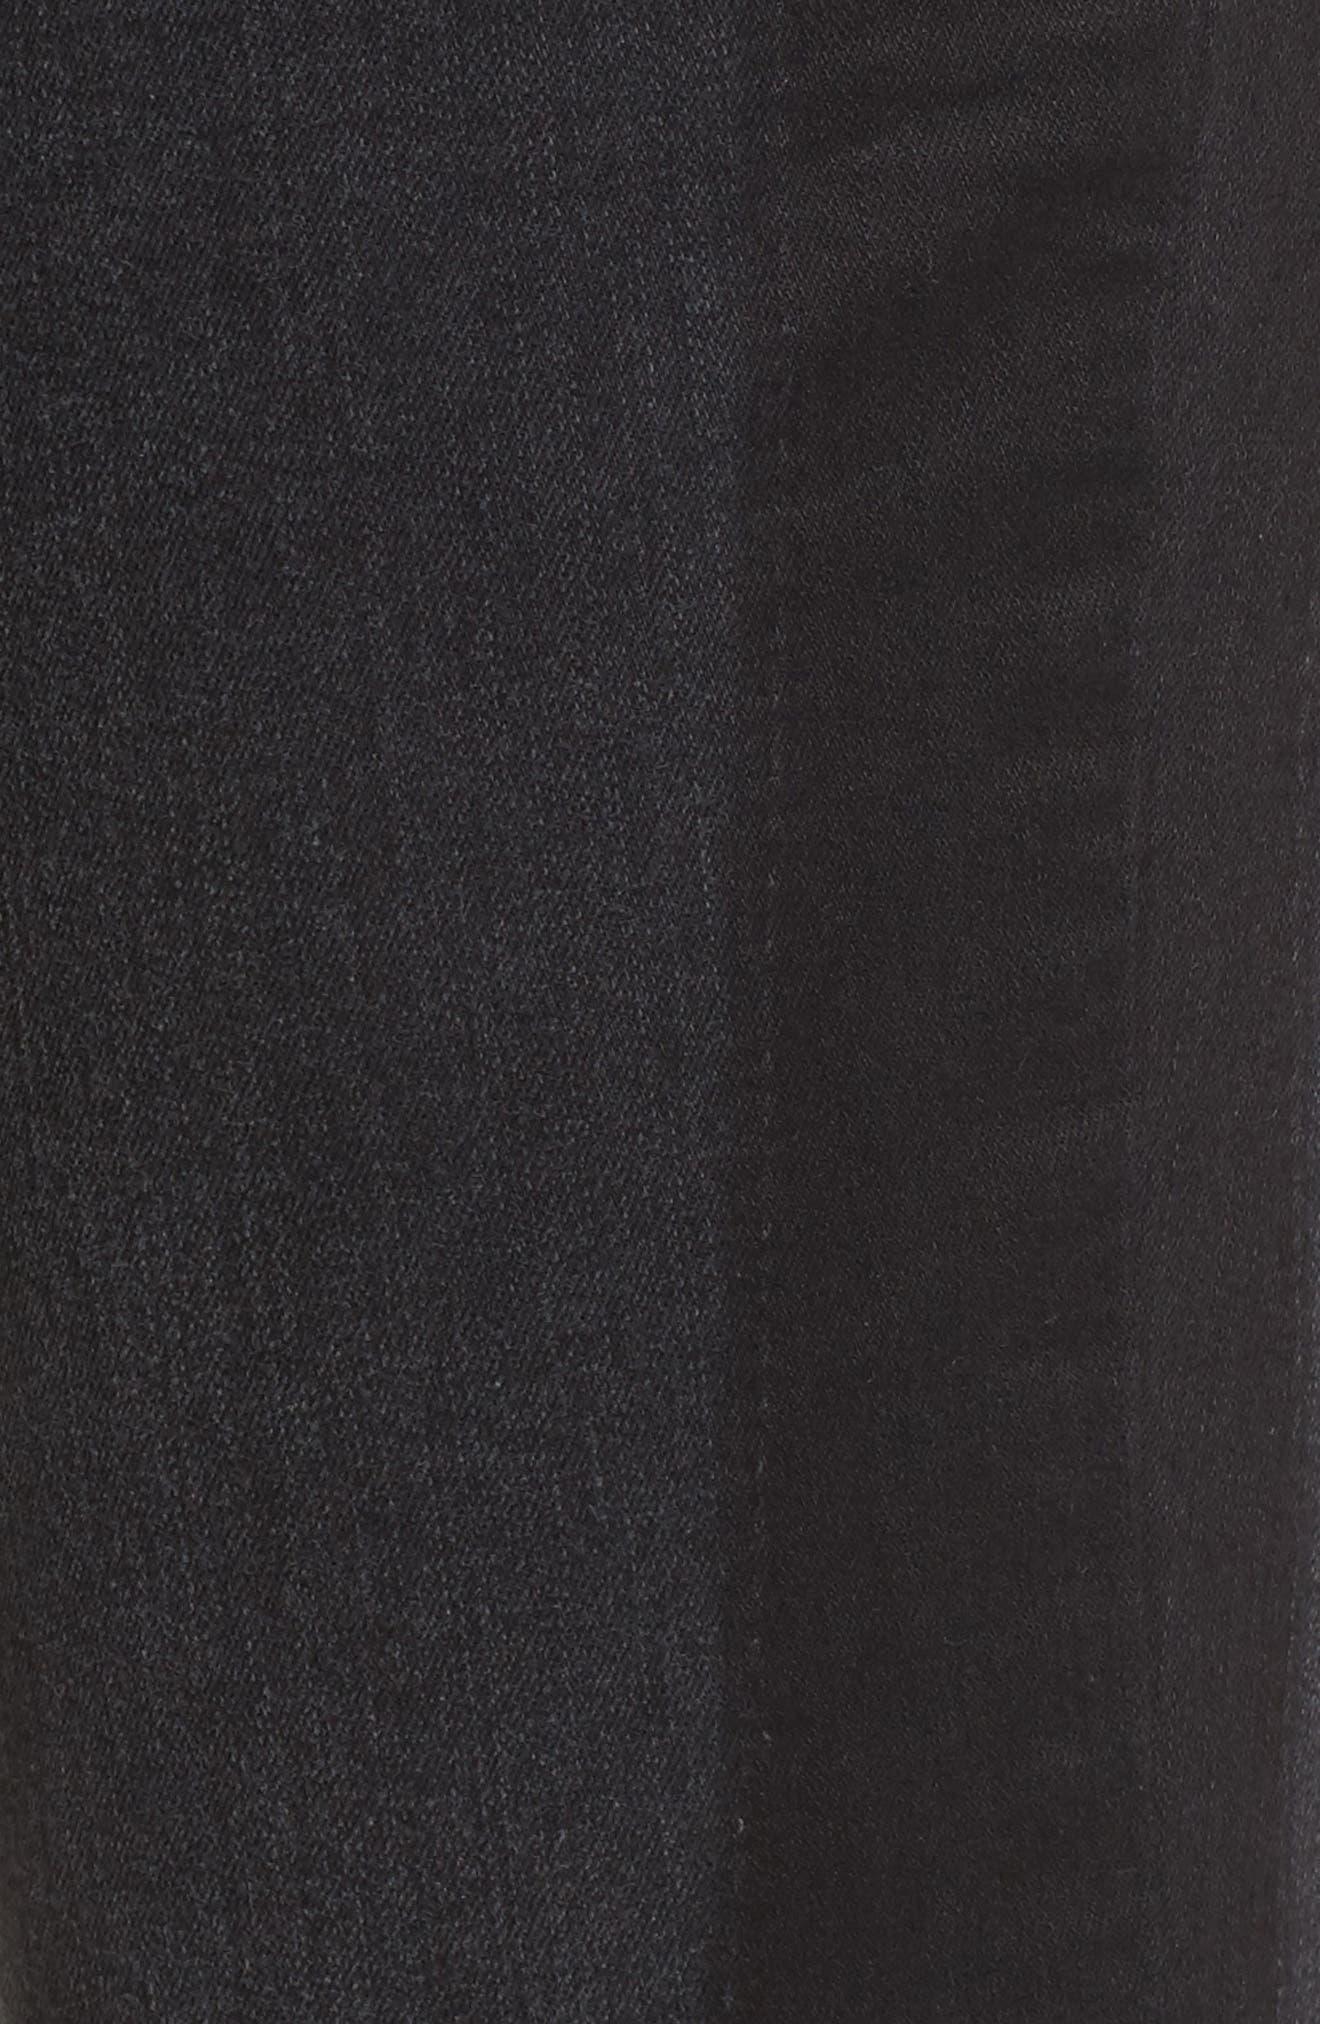 Tuxedo Stripe Skinny Jeans,                             Alternate thumbnail 5, color,                             020